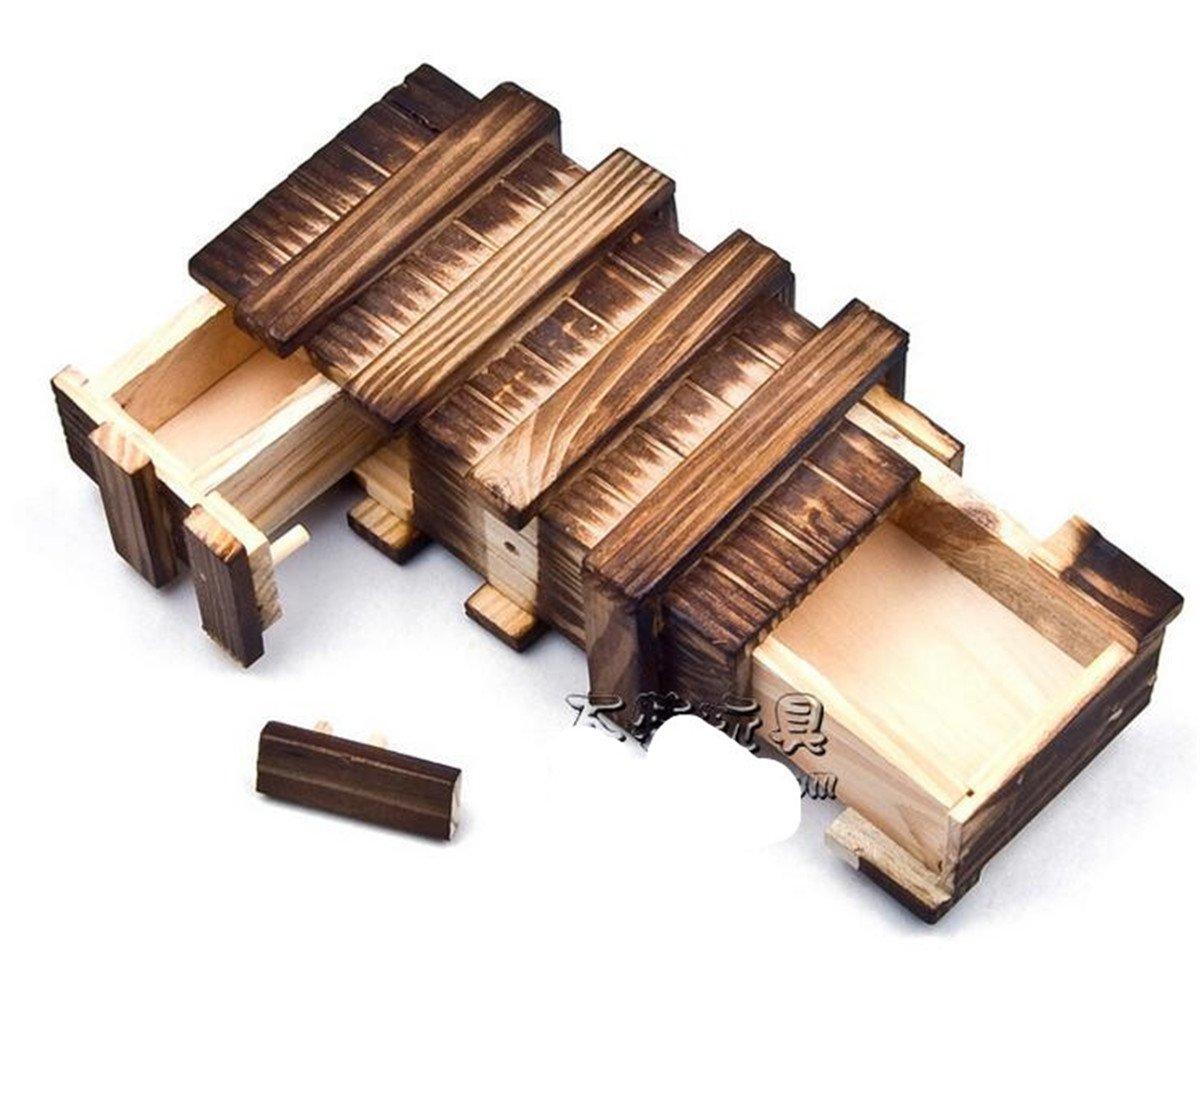 3 Open Box Magic Toys Carbonized Wooden Box Hole Ming Lock Jackdaine